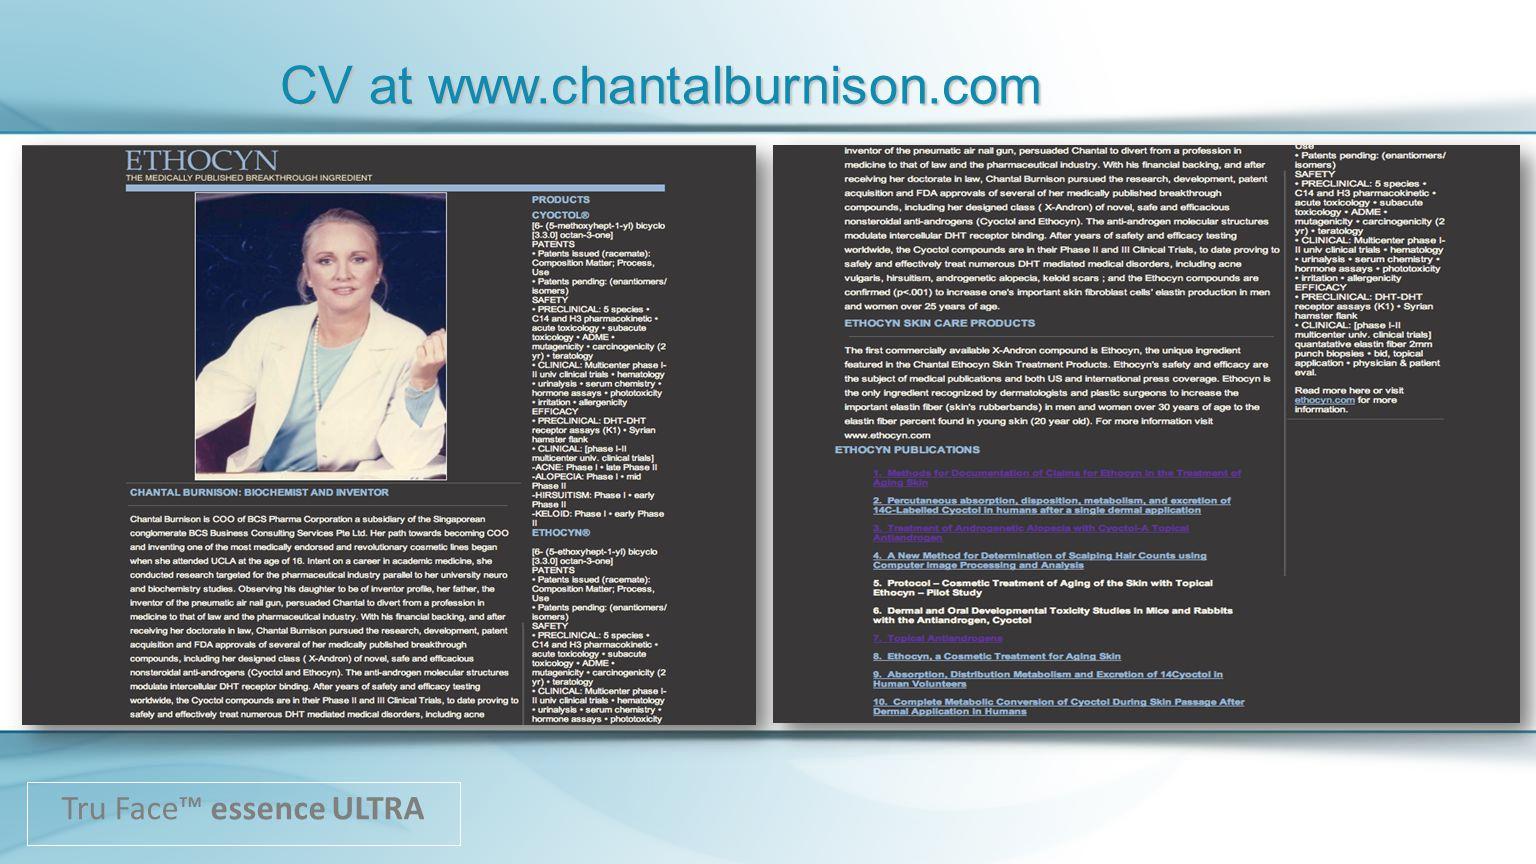 CV at www.chantalburnison.com